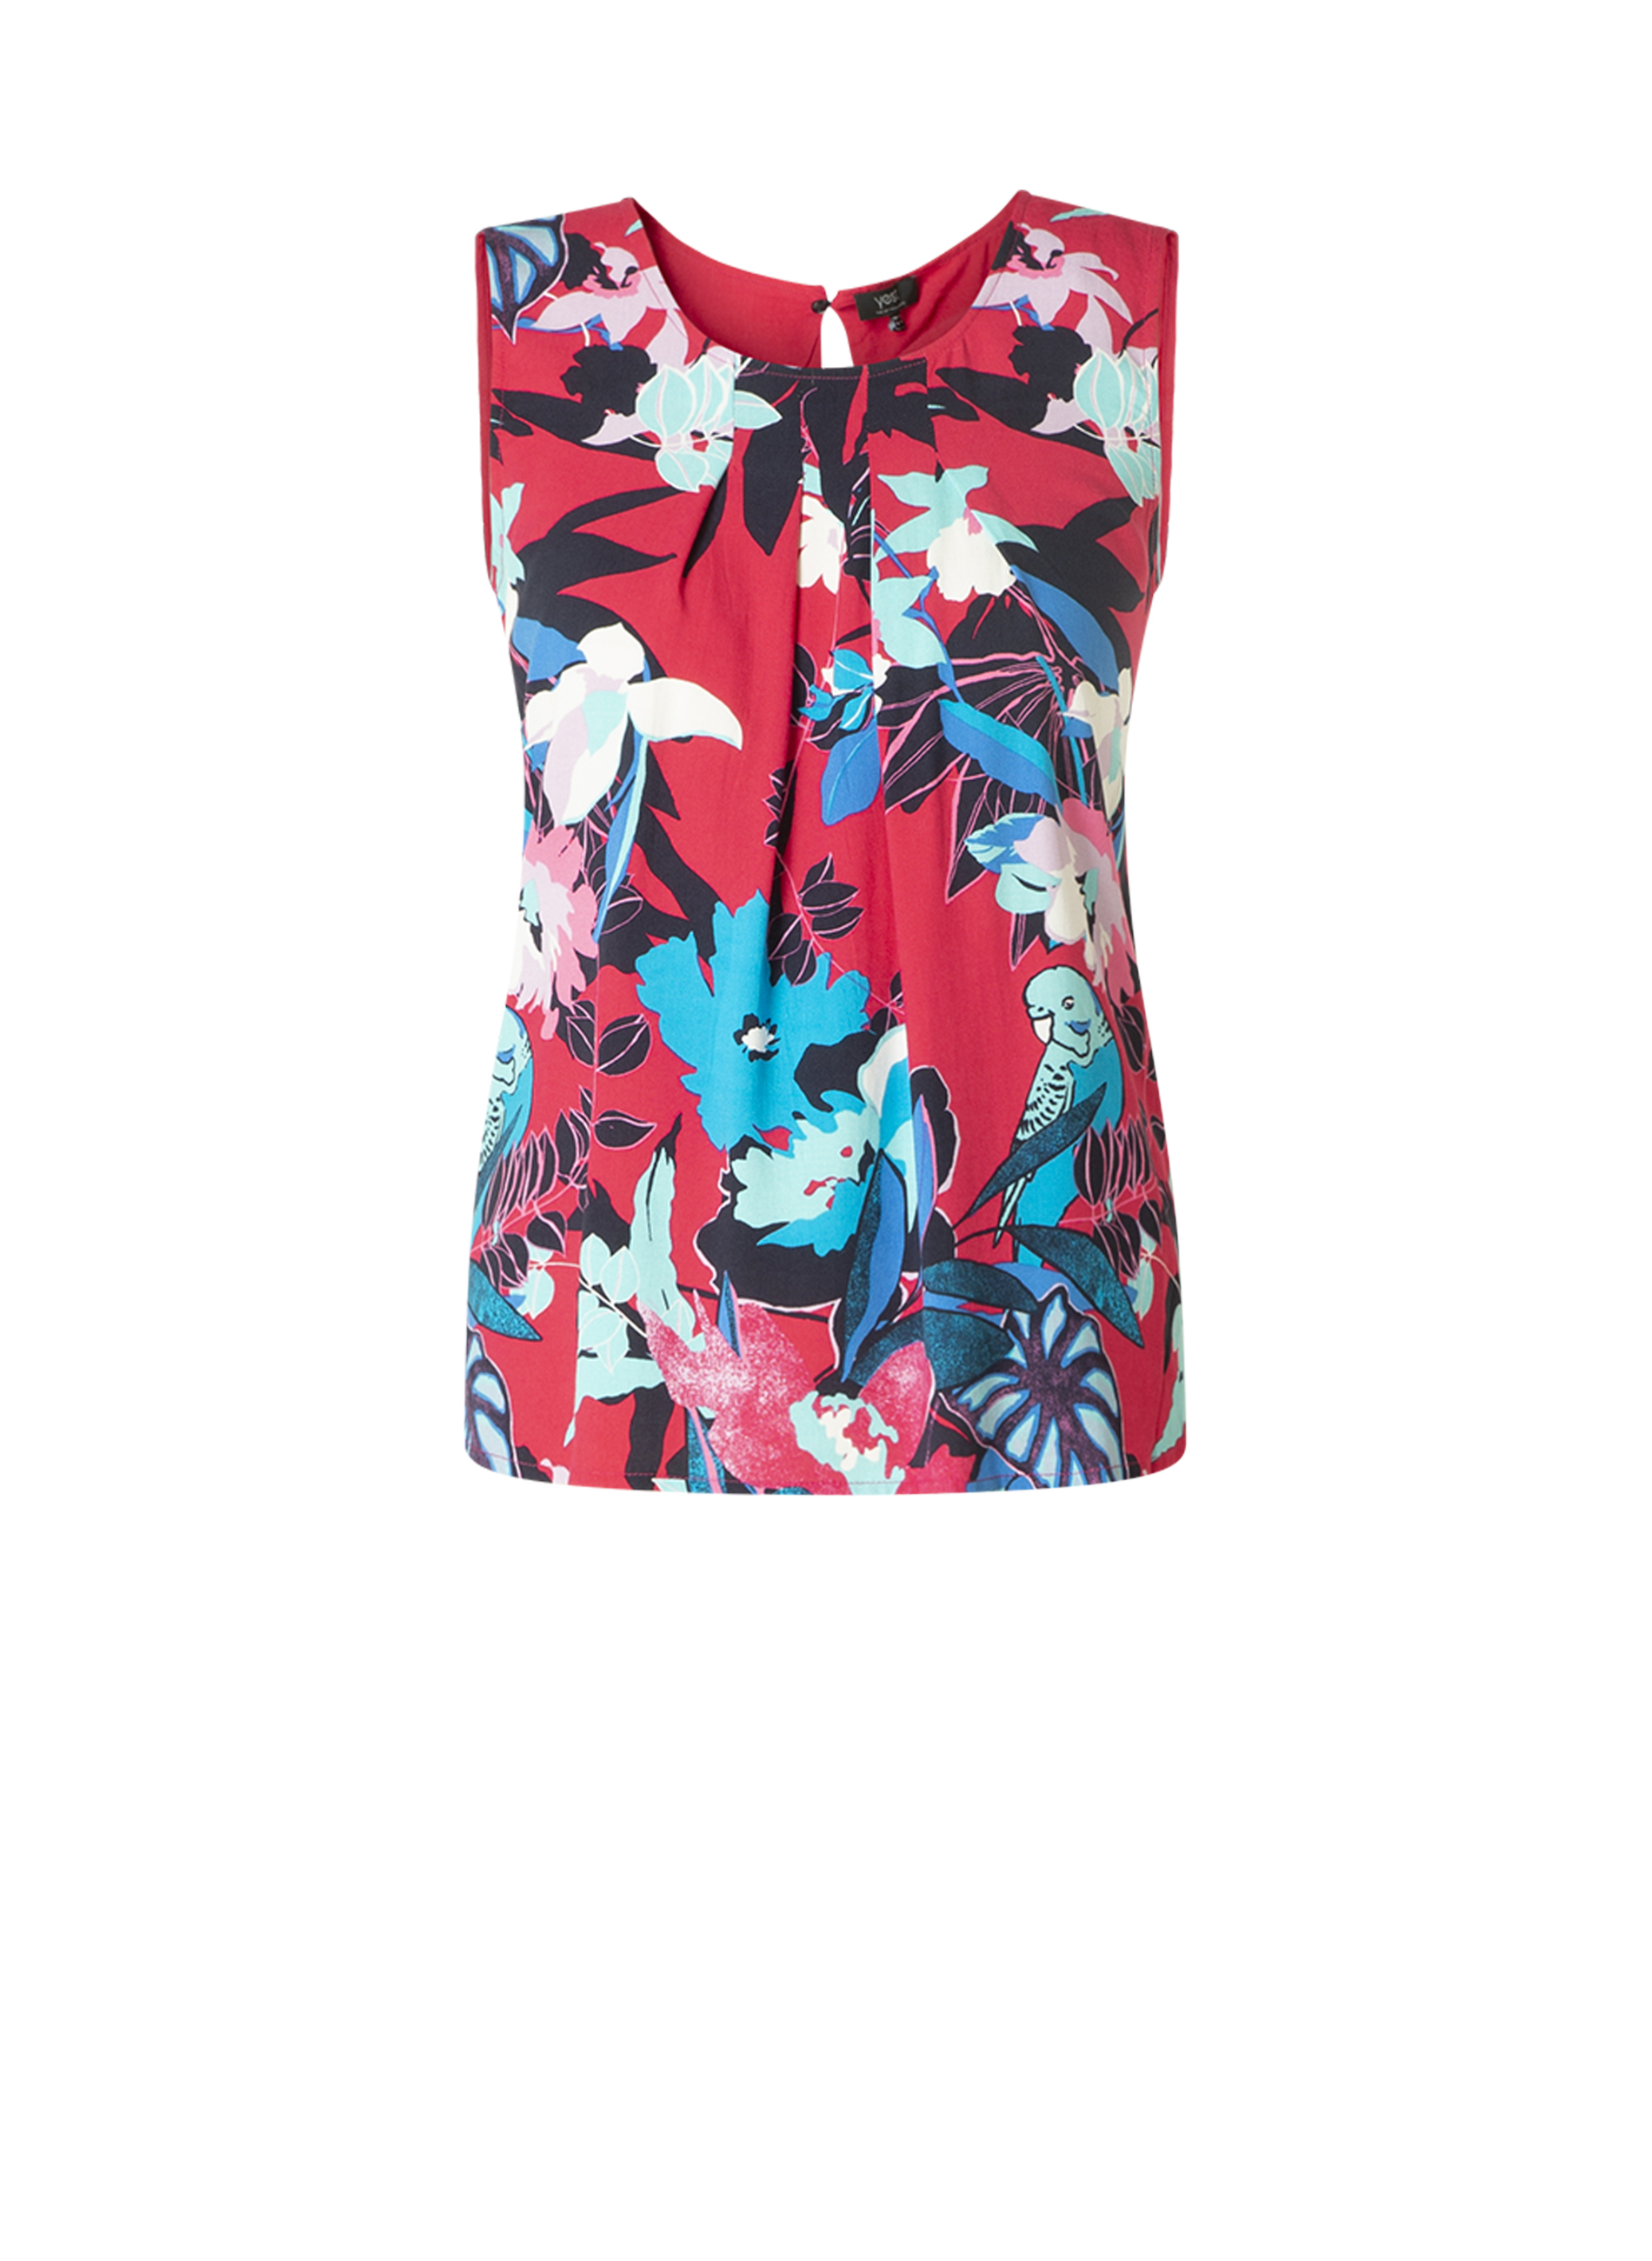 Yesta shirt Leonoor 80 cm